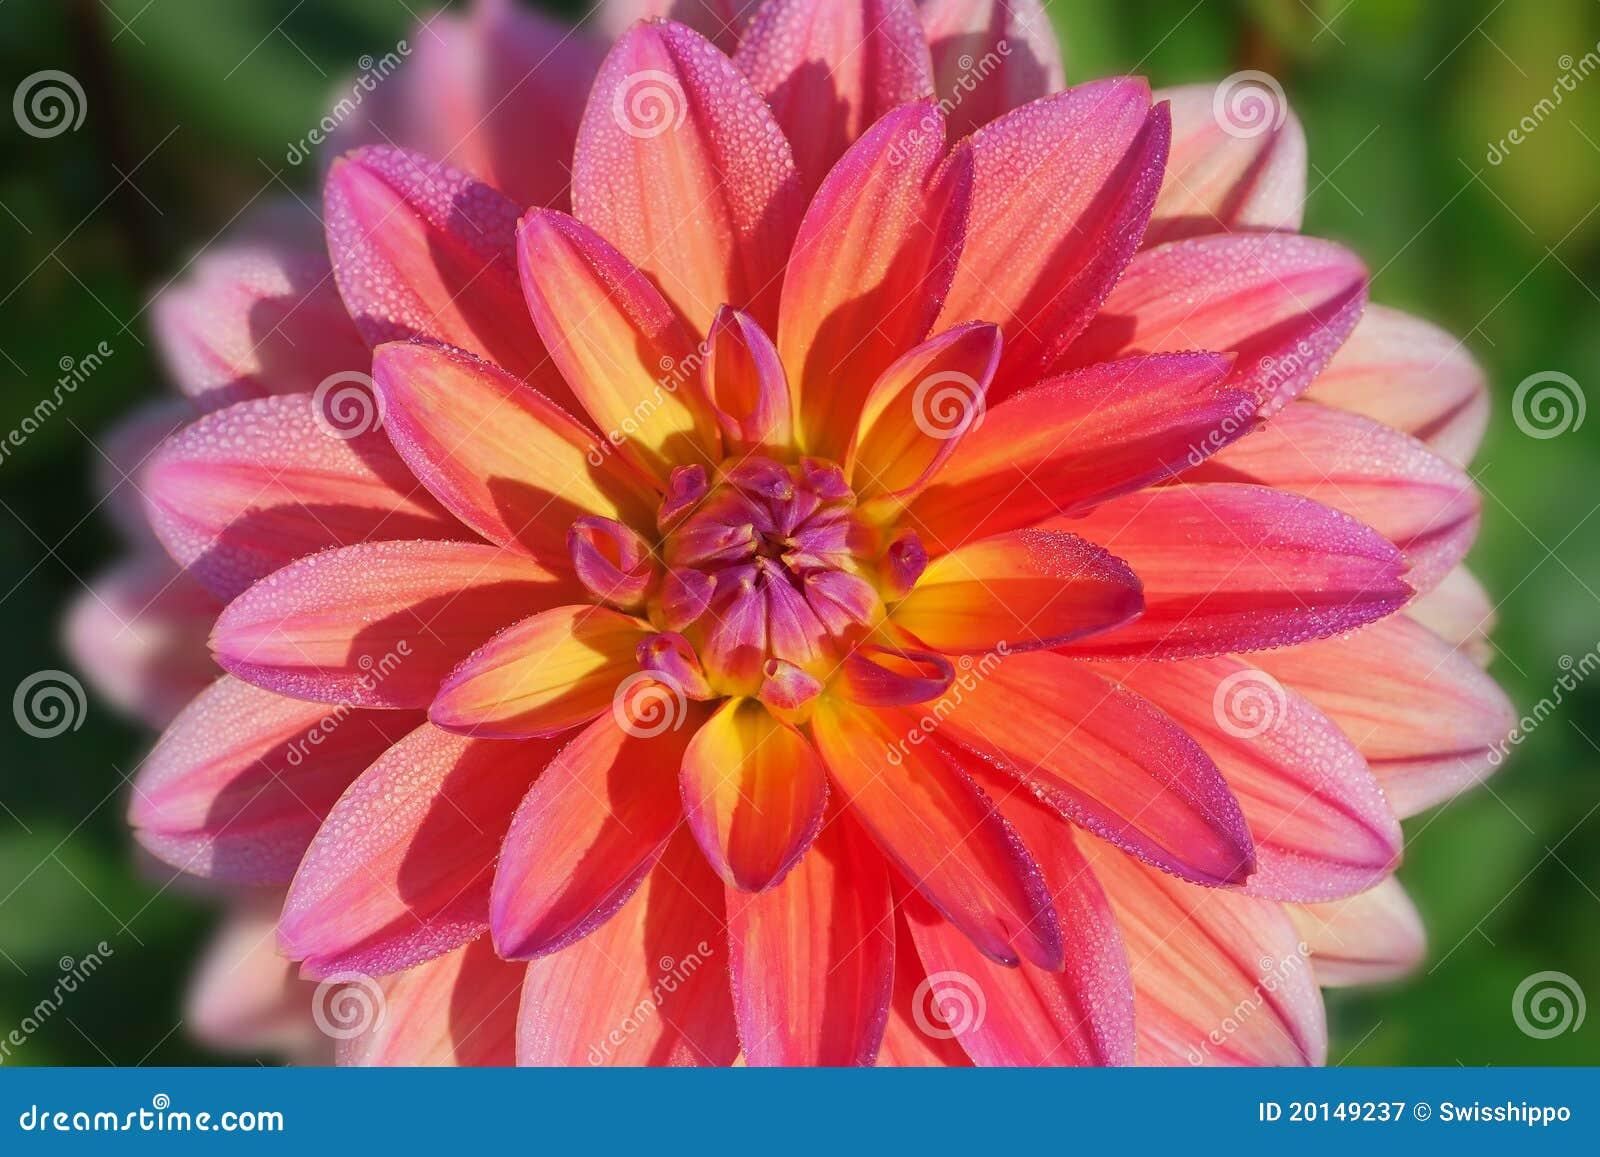 Dahlia flower stock image image of closeup peony botany 20149237 colorful dahlia flower with morning dew drops izmirmasajfo